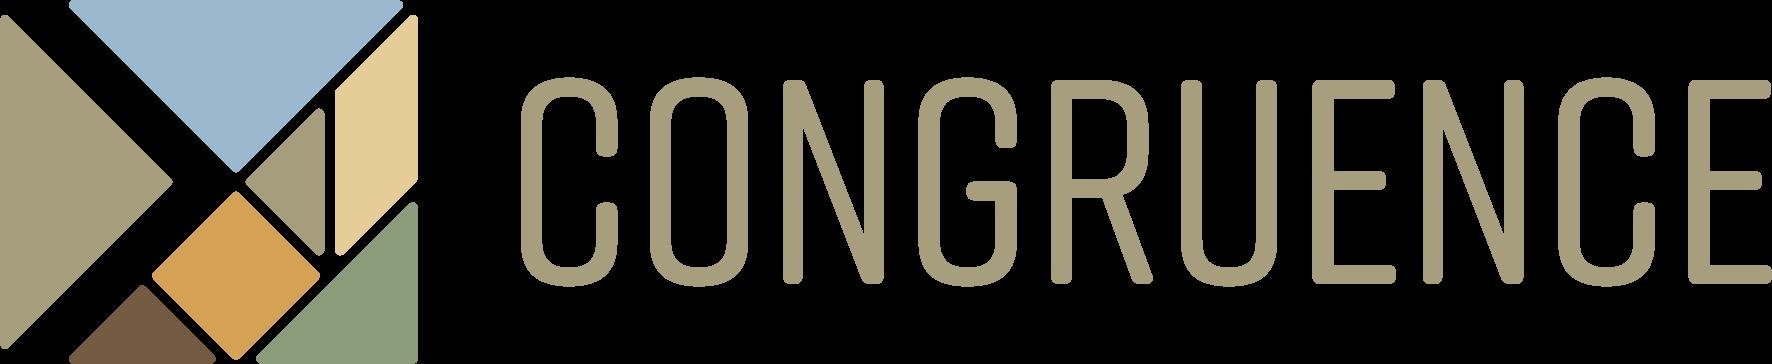 congruence